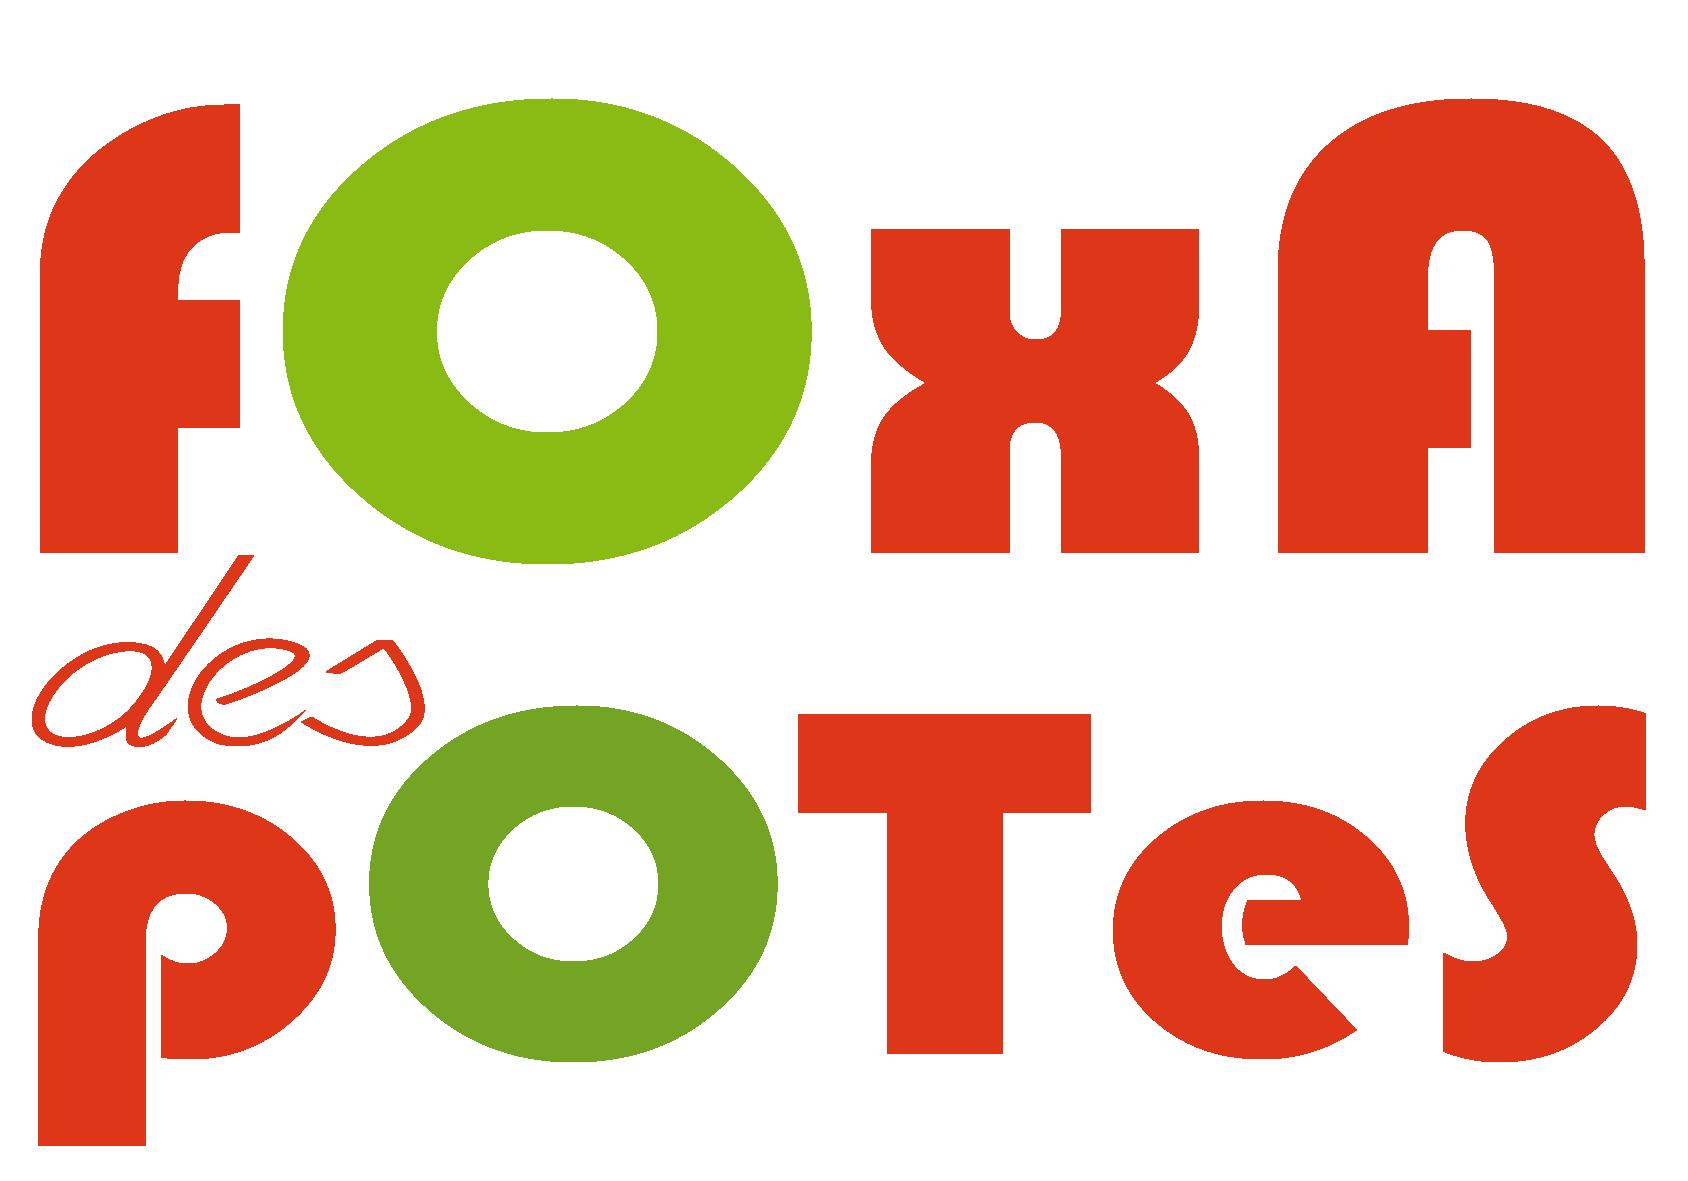 http://static.onlc.eu/foxadespotesNDD//131333709341.png